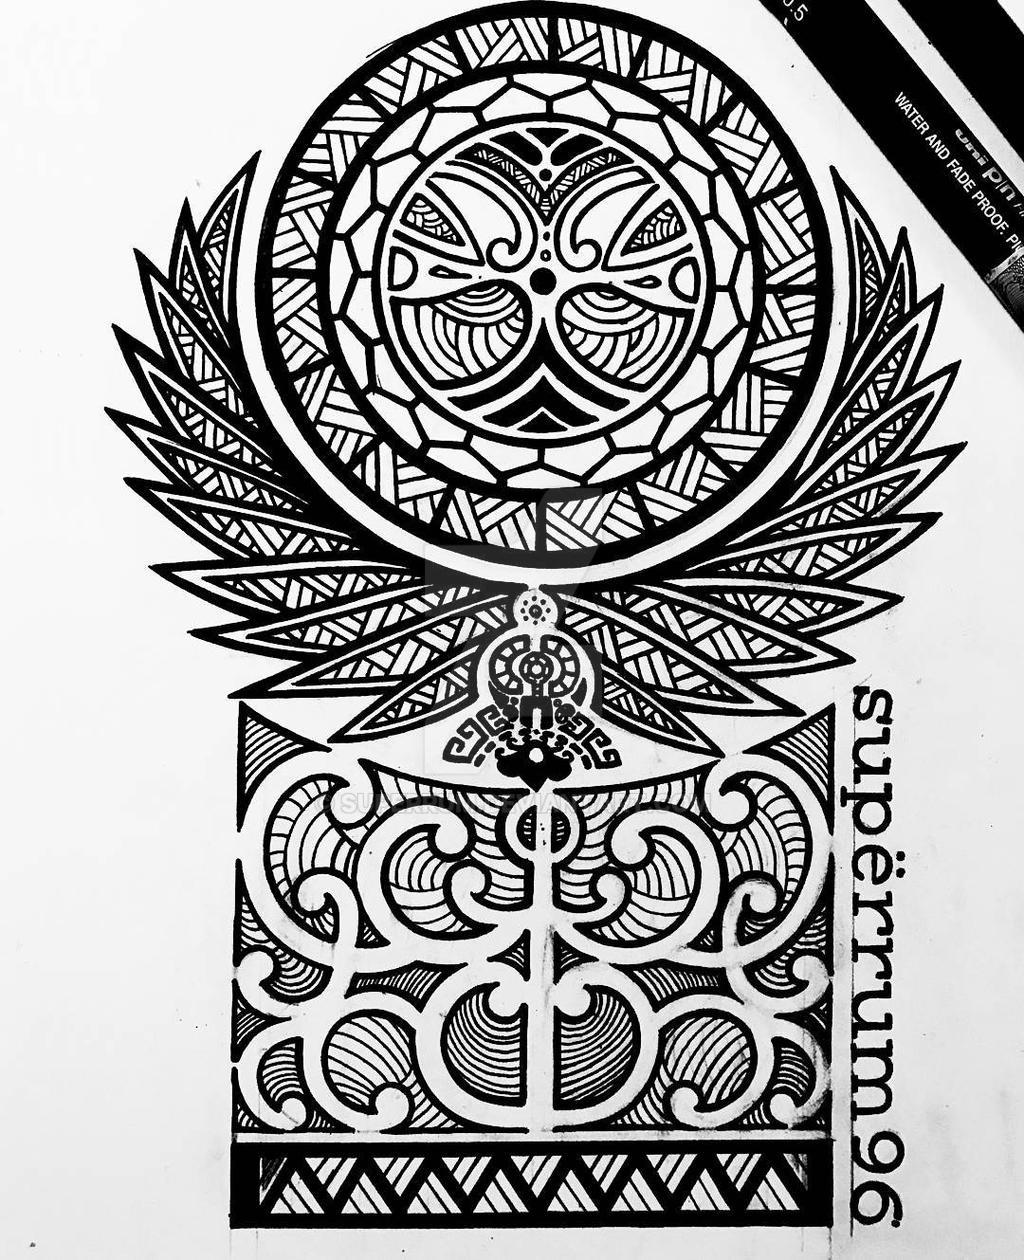 Maori Tattoo Design Wallpaper Wp300369: Maori Design By SuperRum On DeviantArt